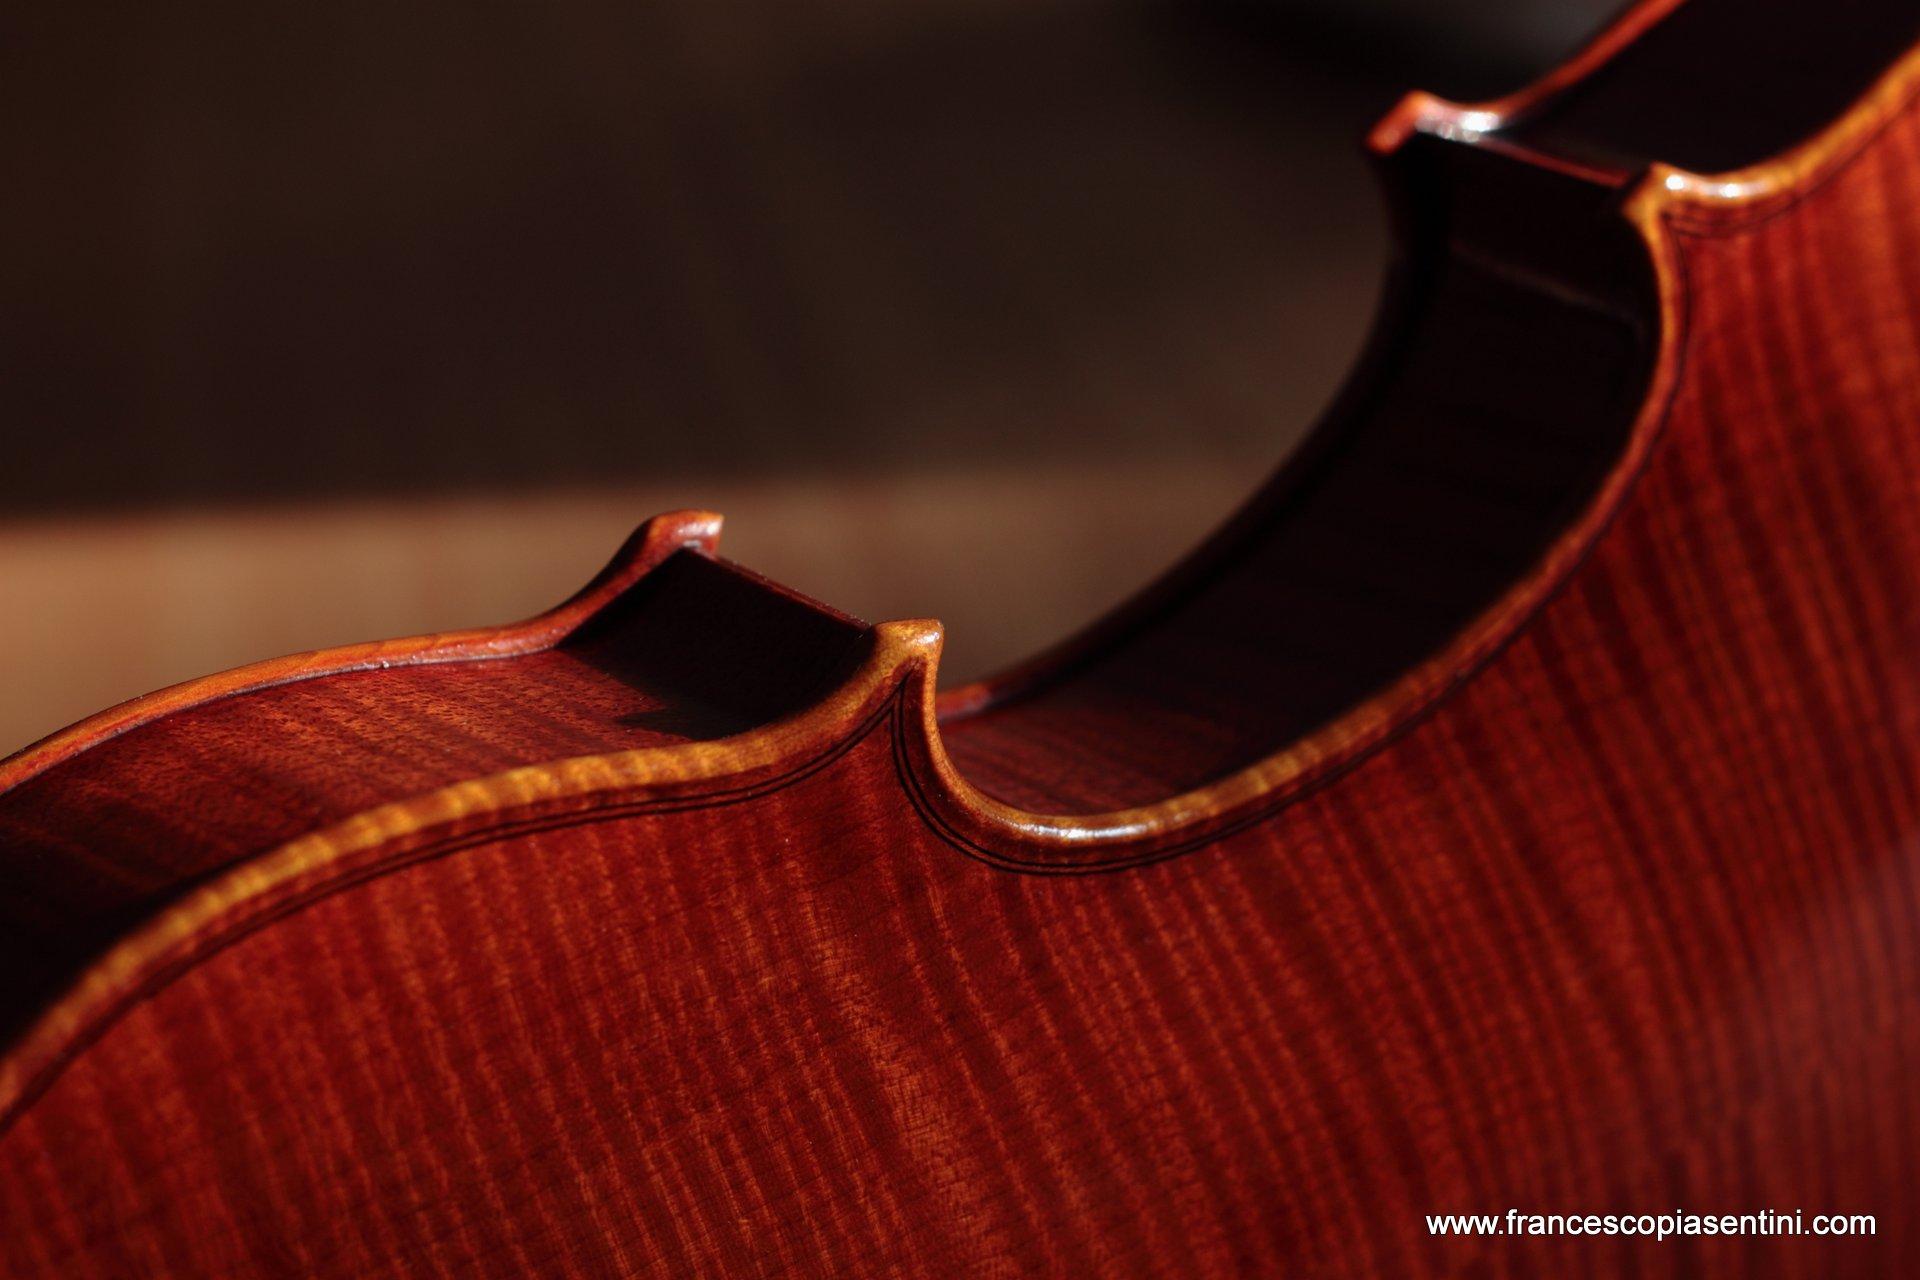 violino modello Montagnana 2015